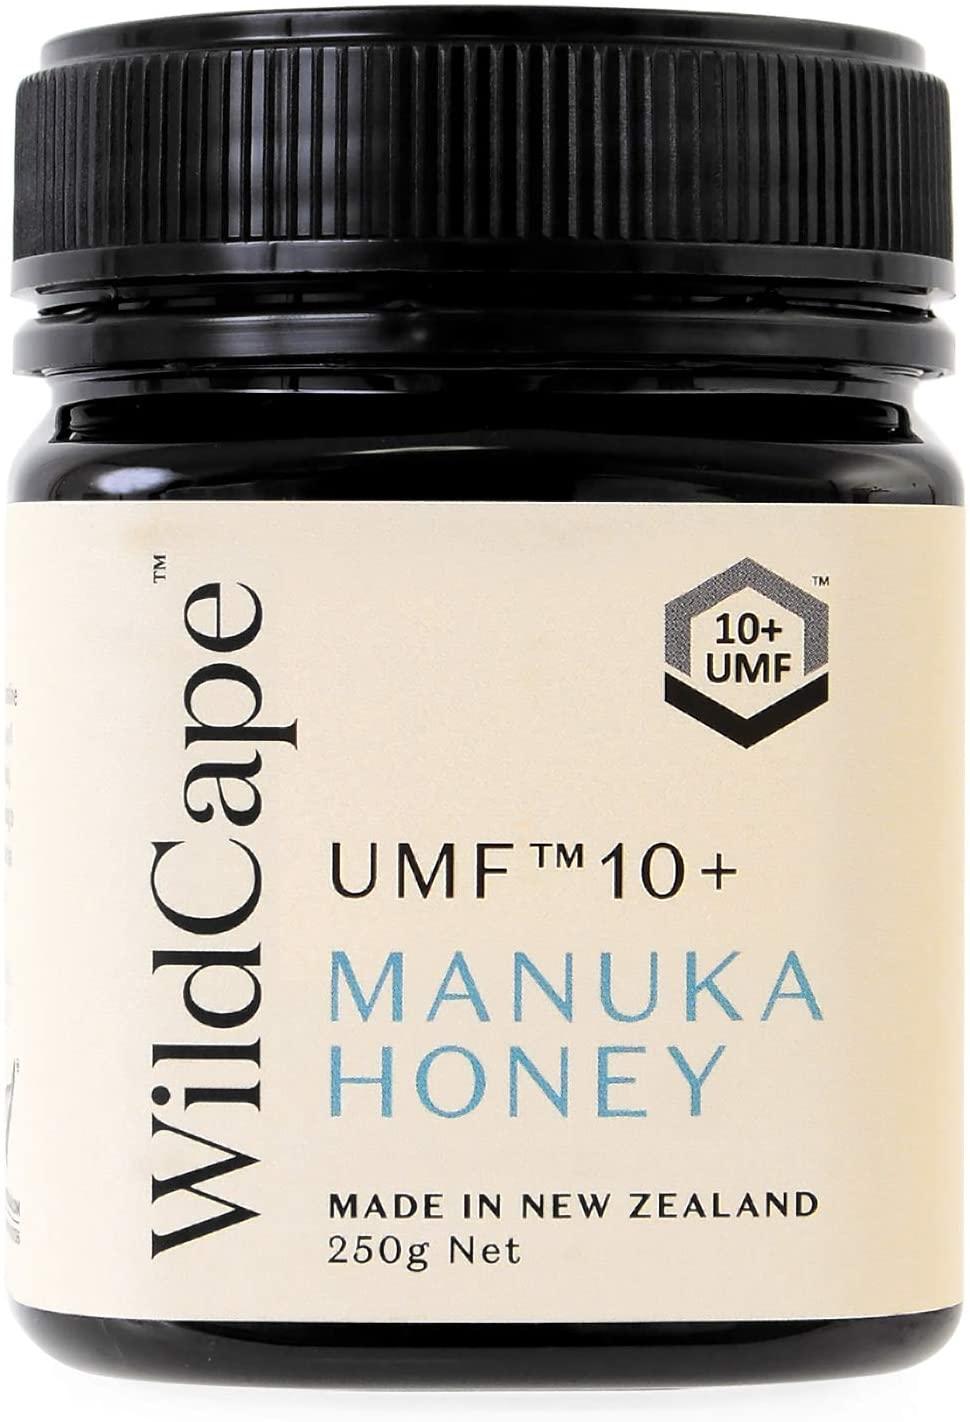 Wild Cape(ワイルドケープ) UMF 10+ Manuka Honeyの商品画像